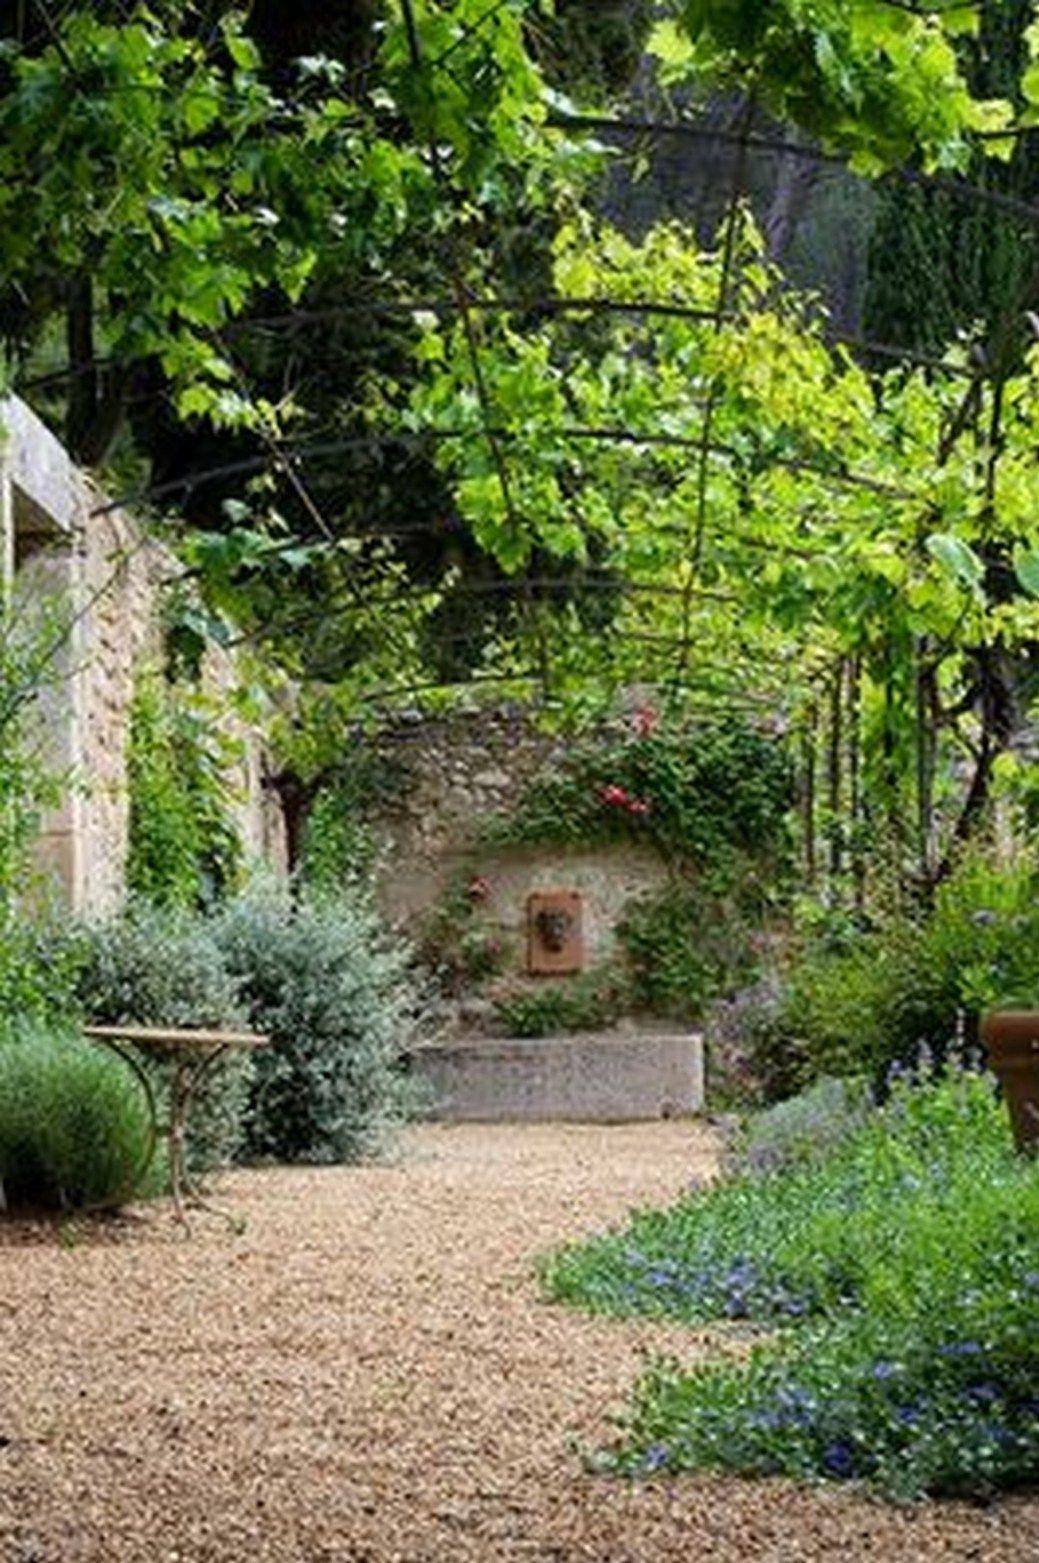 Modern Landscaping Mediterranean Garden Ideas Mediterranean Garden Design Mediterranean Garden Modern Landscaping